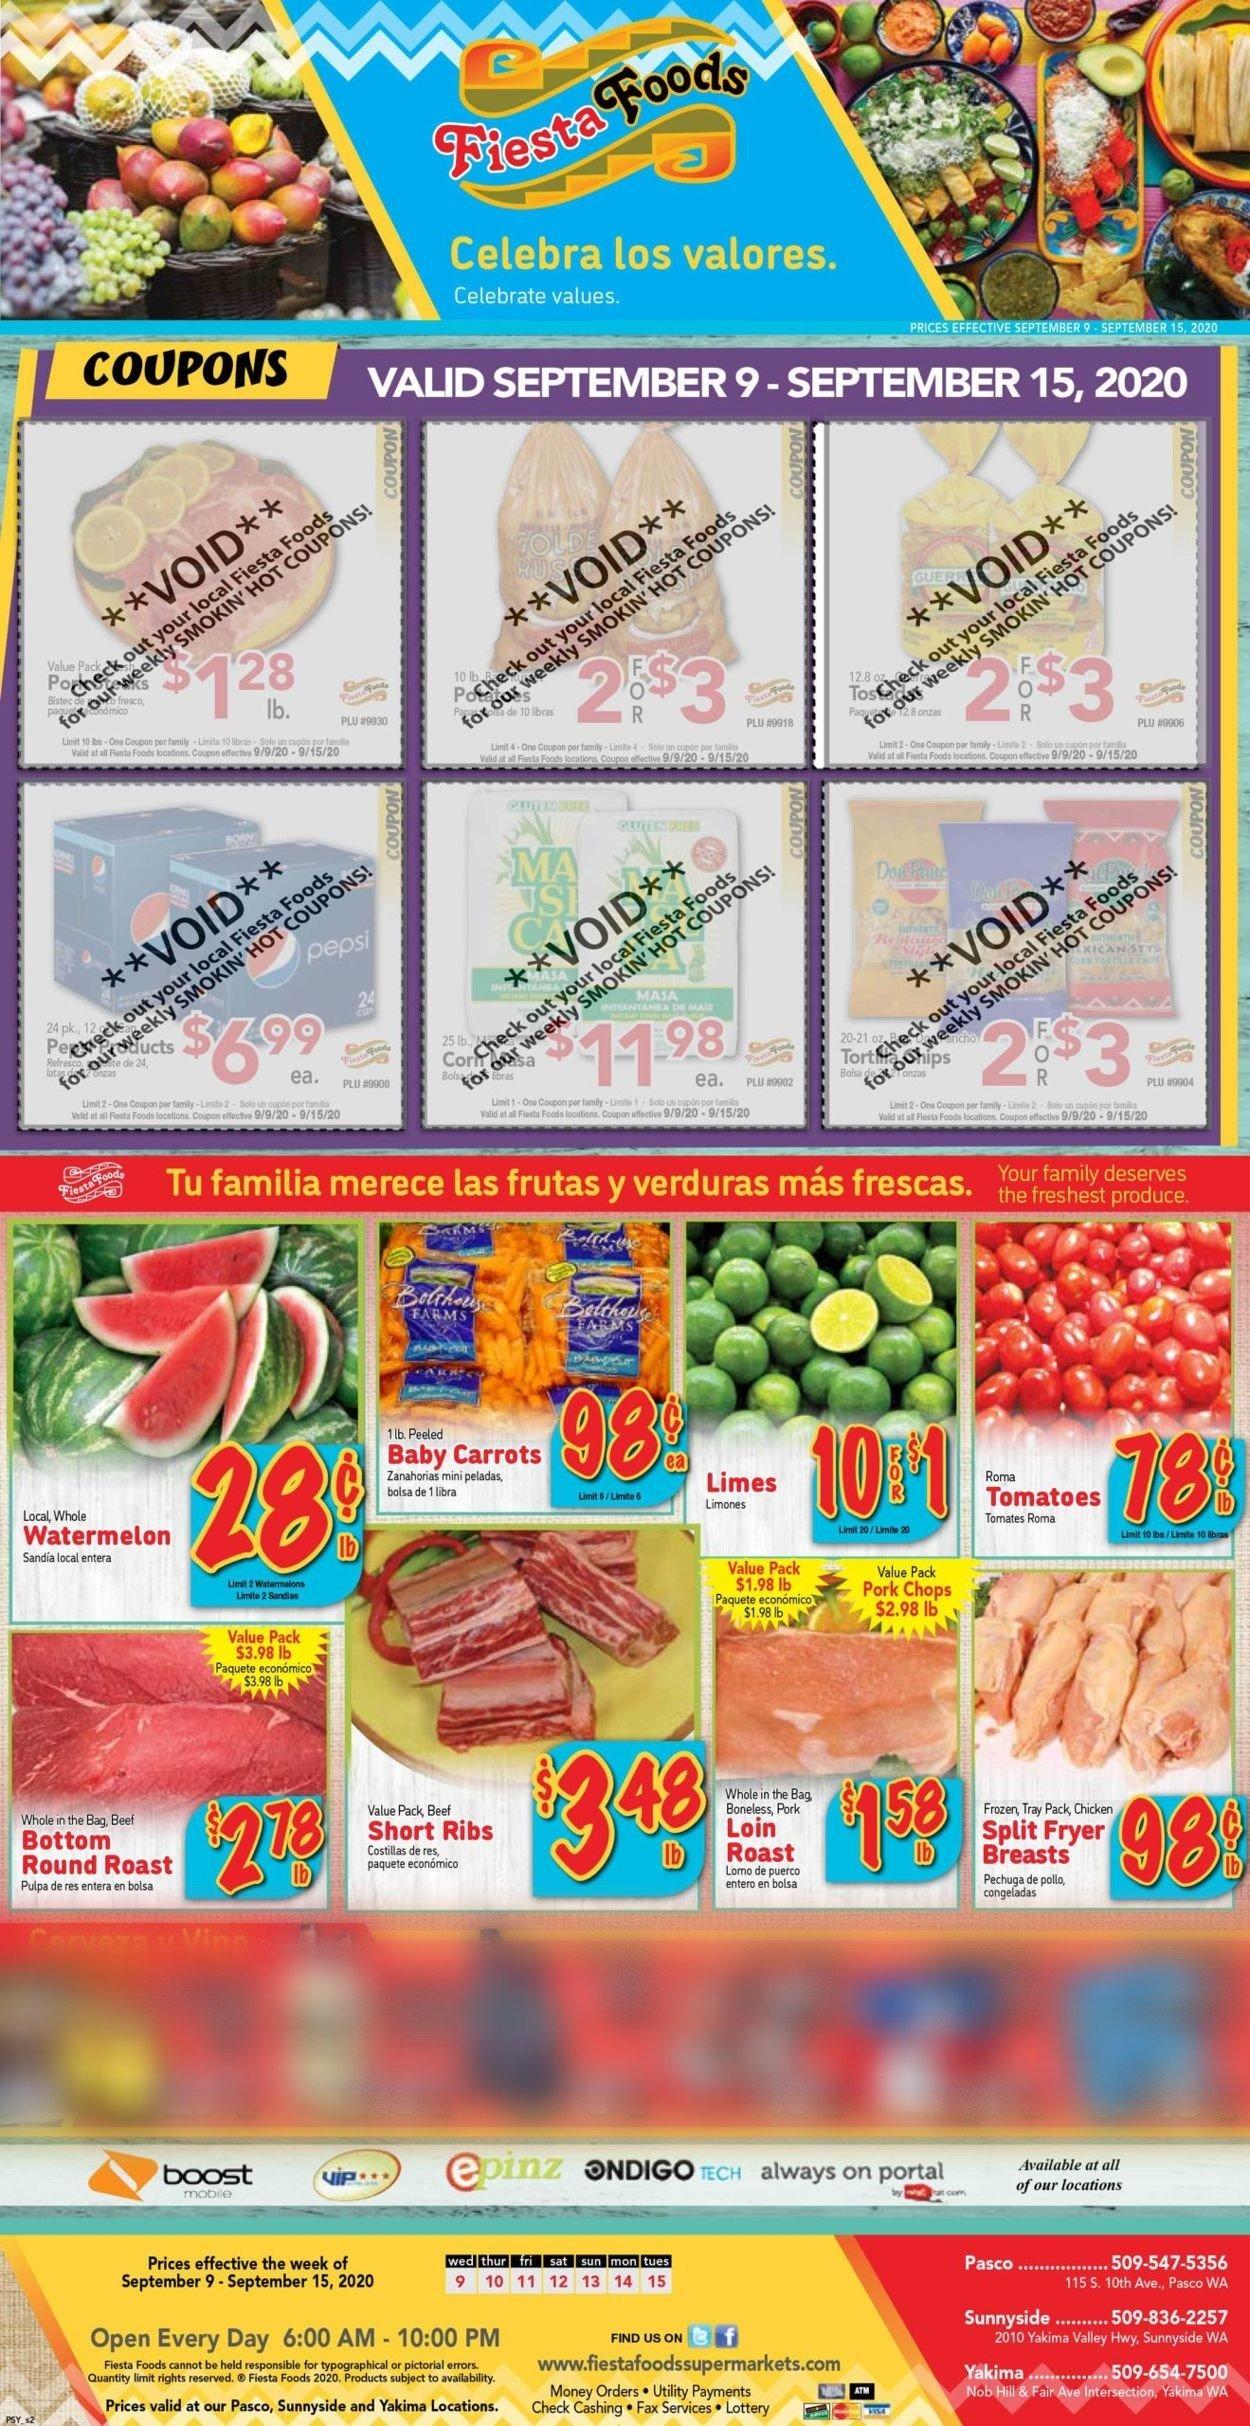 Fiesta Foods SuperMarkets Weekly Ad Circular - valid 09/09-09/15/2020